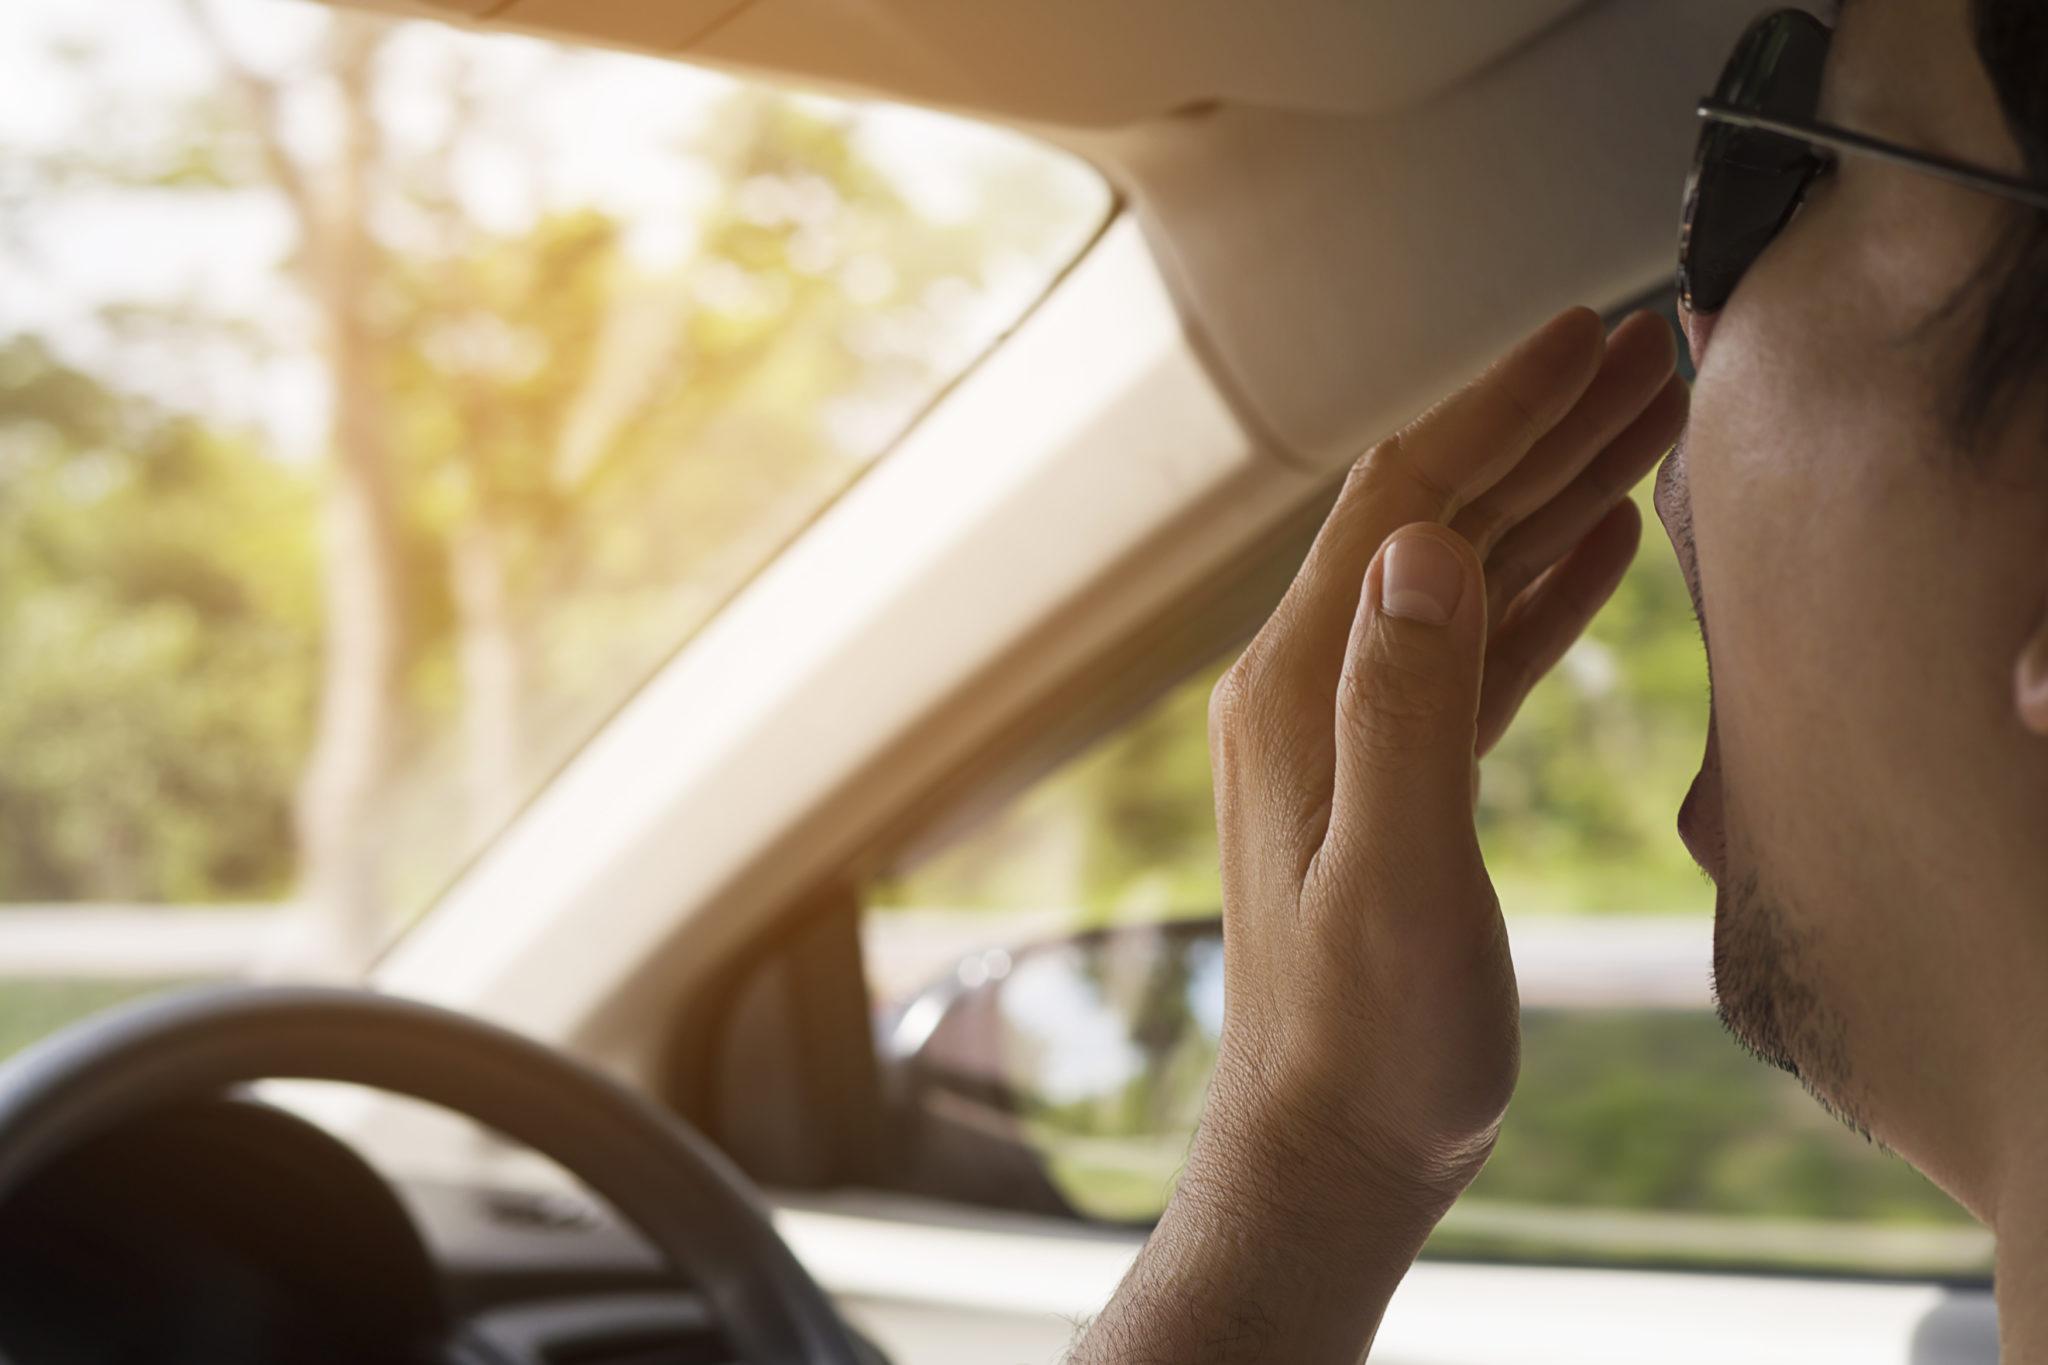 Hombre bostezando en coche